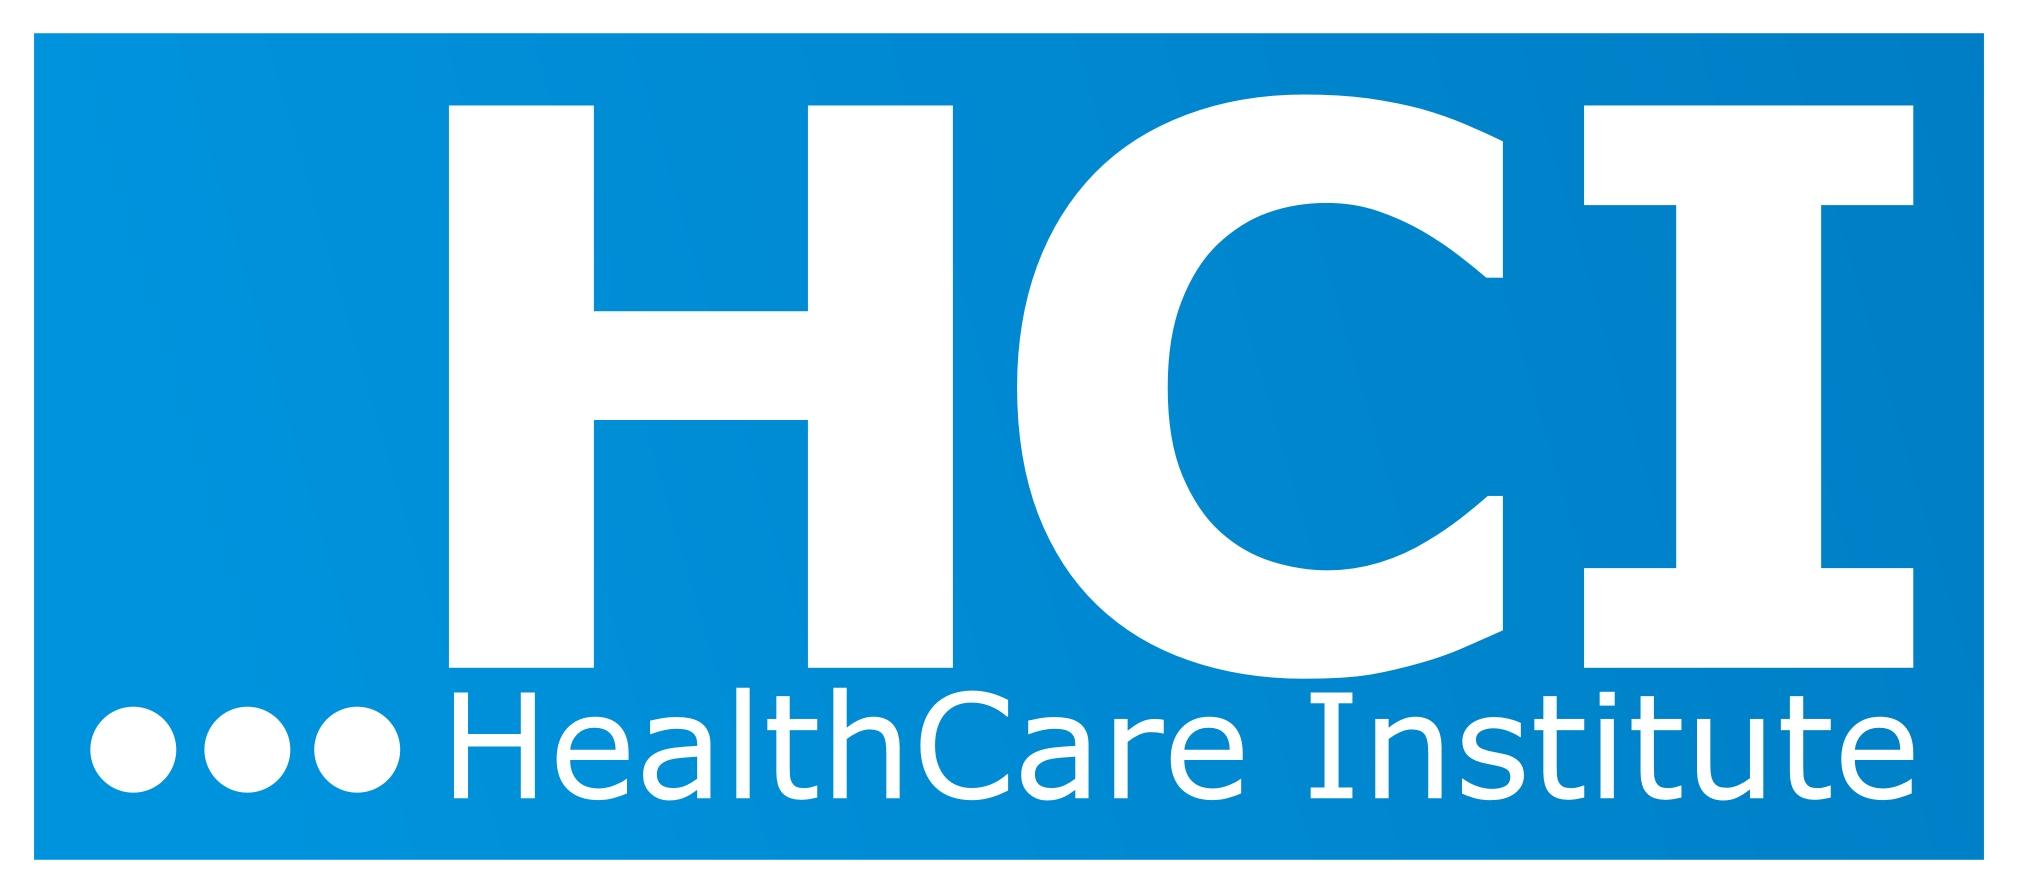 http://www.spdn-cr.org/media/soubory/logo-spolupracujici-org/logo-hci.jpg